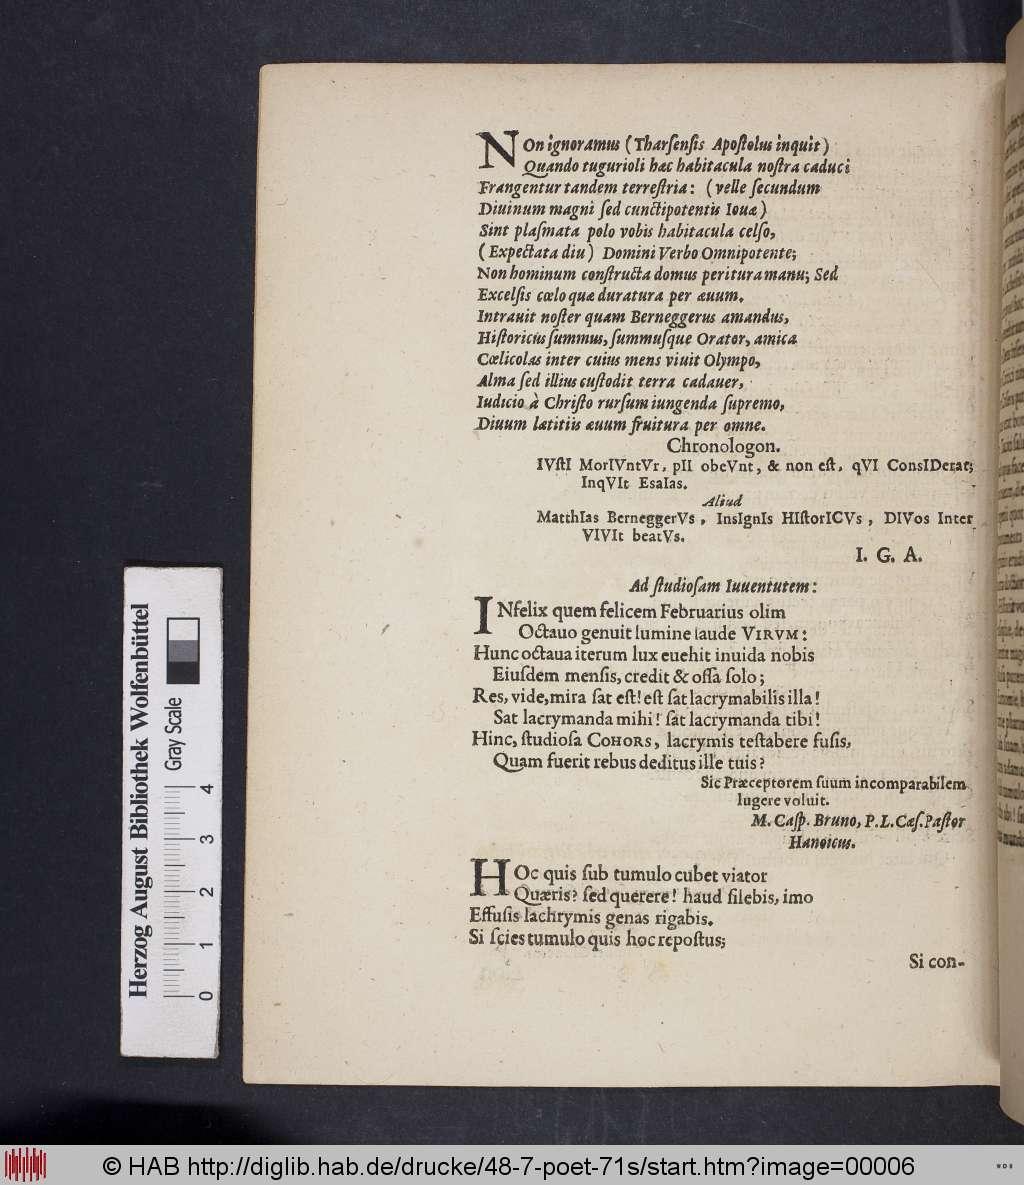 https://diglib.hab.de/drucke/48-7-poet-71s/00006.jpg